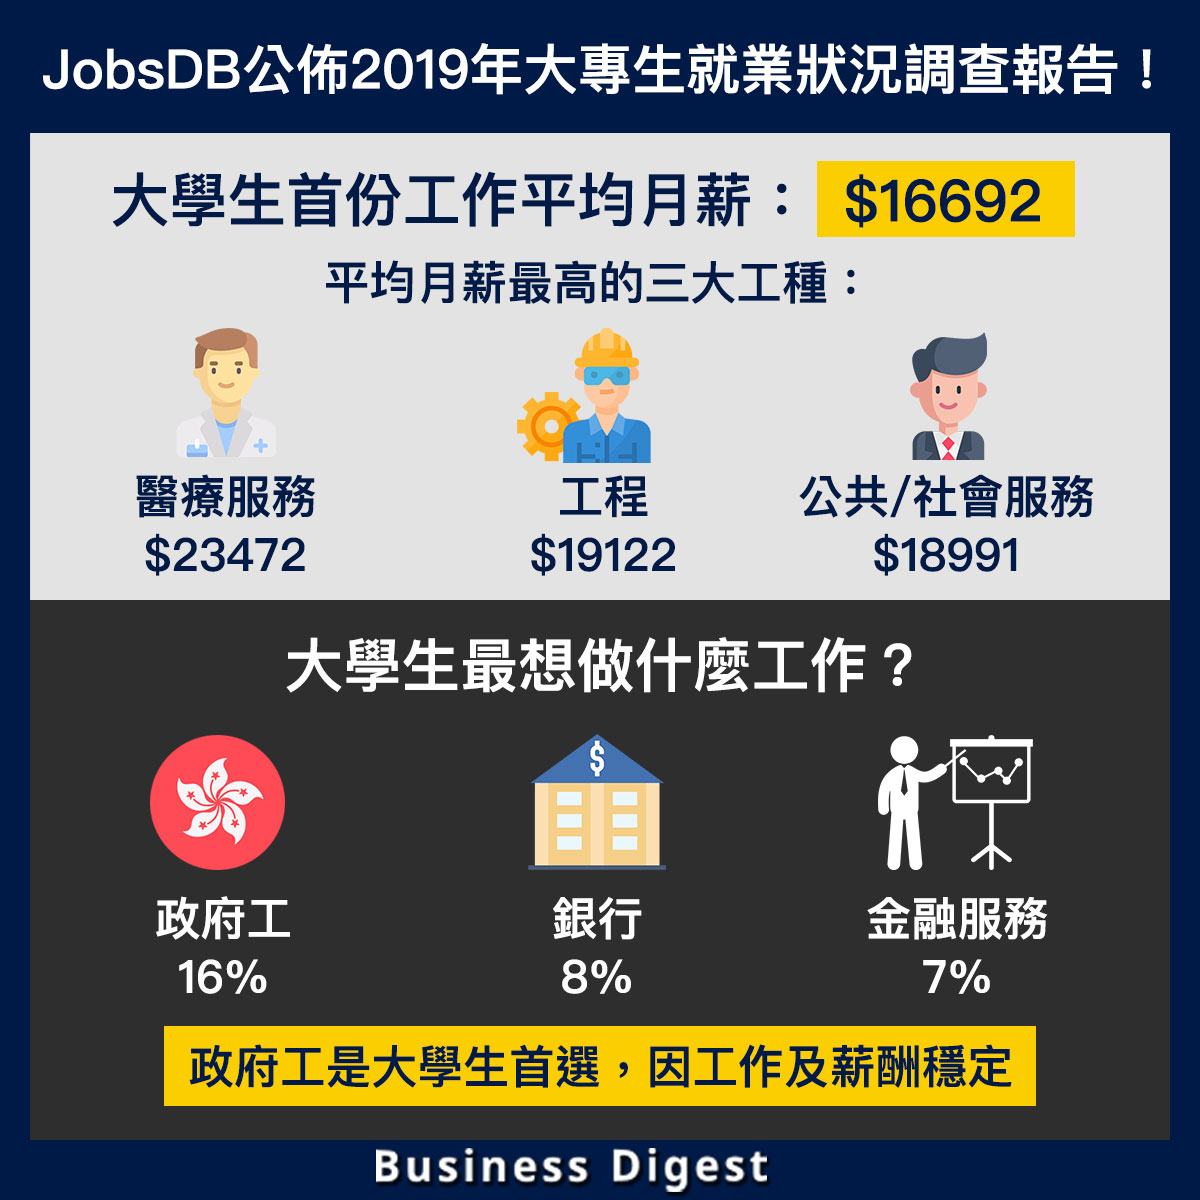 JobsDB公佈2019年大專生就業狀況調查報告!平均月薪:$16692